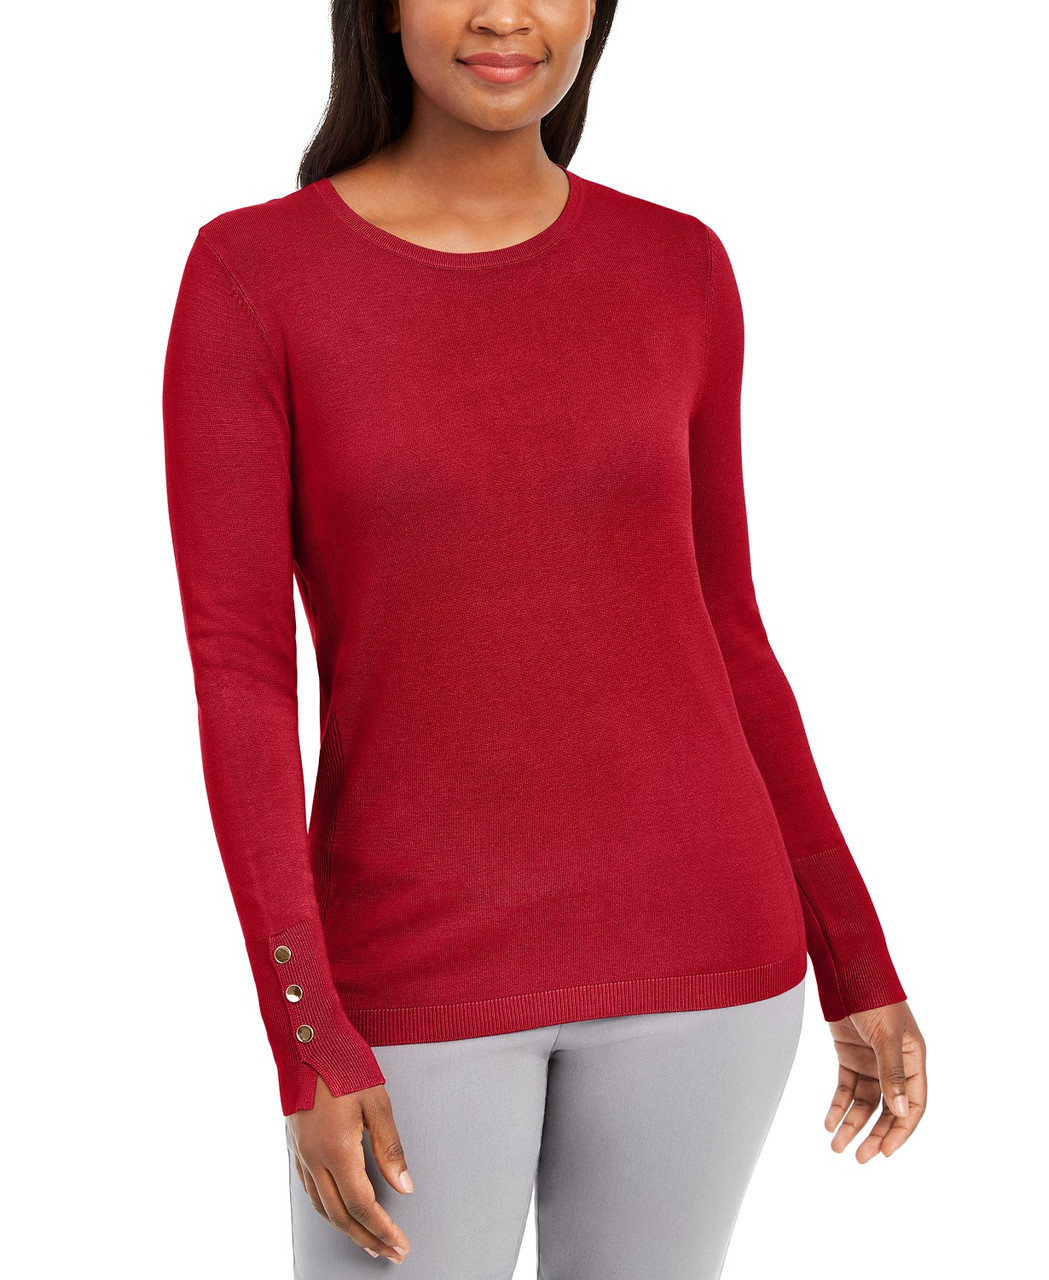 Jm Collection Женская кофта свитер 2000000394596